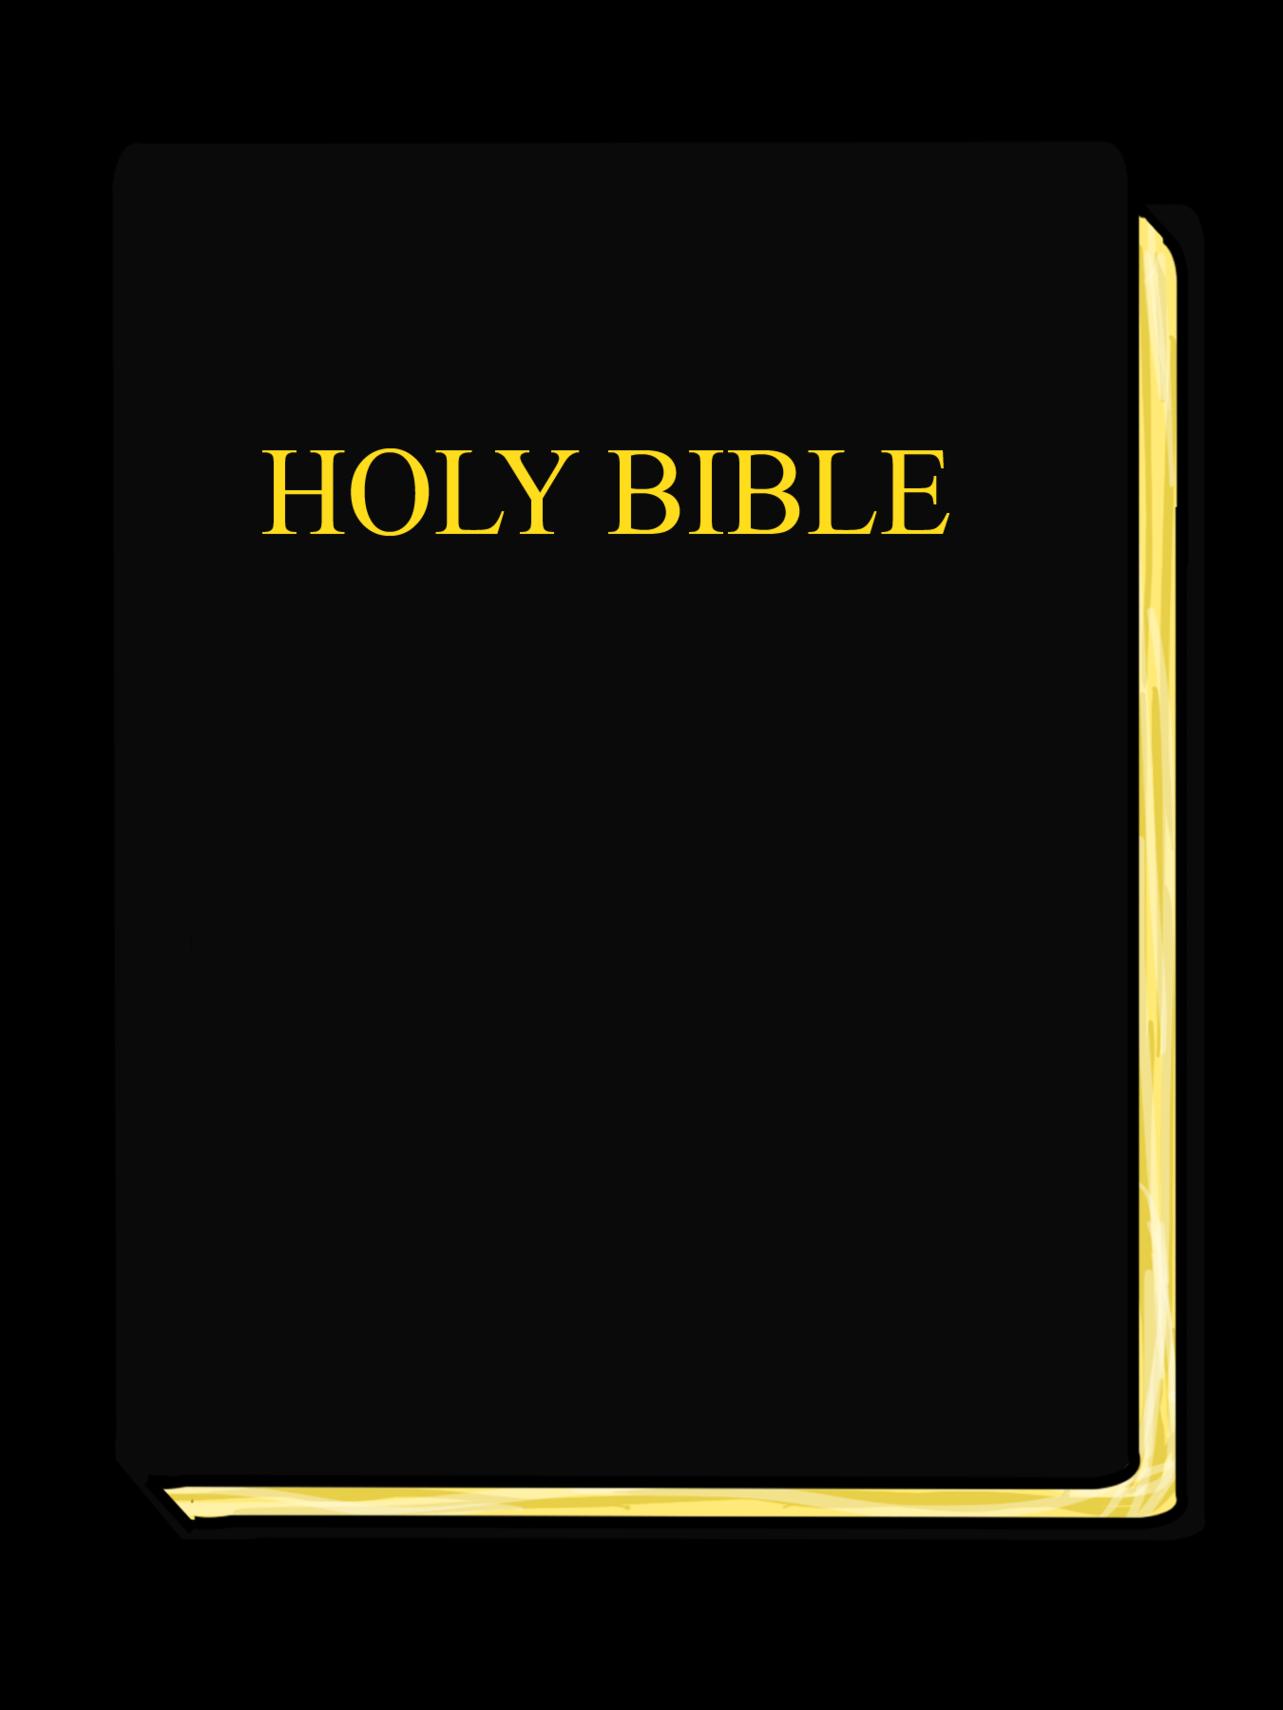 Cross bible clipart black and white jpg free Free bible cliparts - Clipart Collection | Free bible clipart, clip ... jpg free